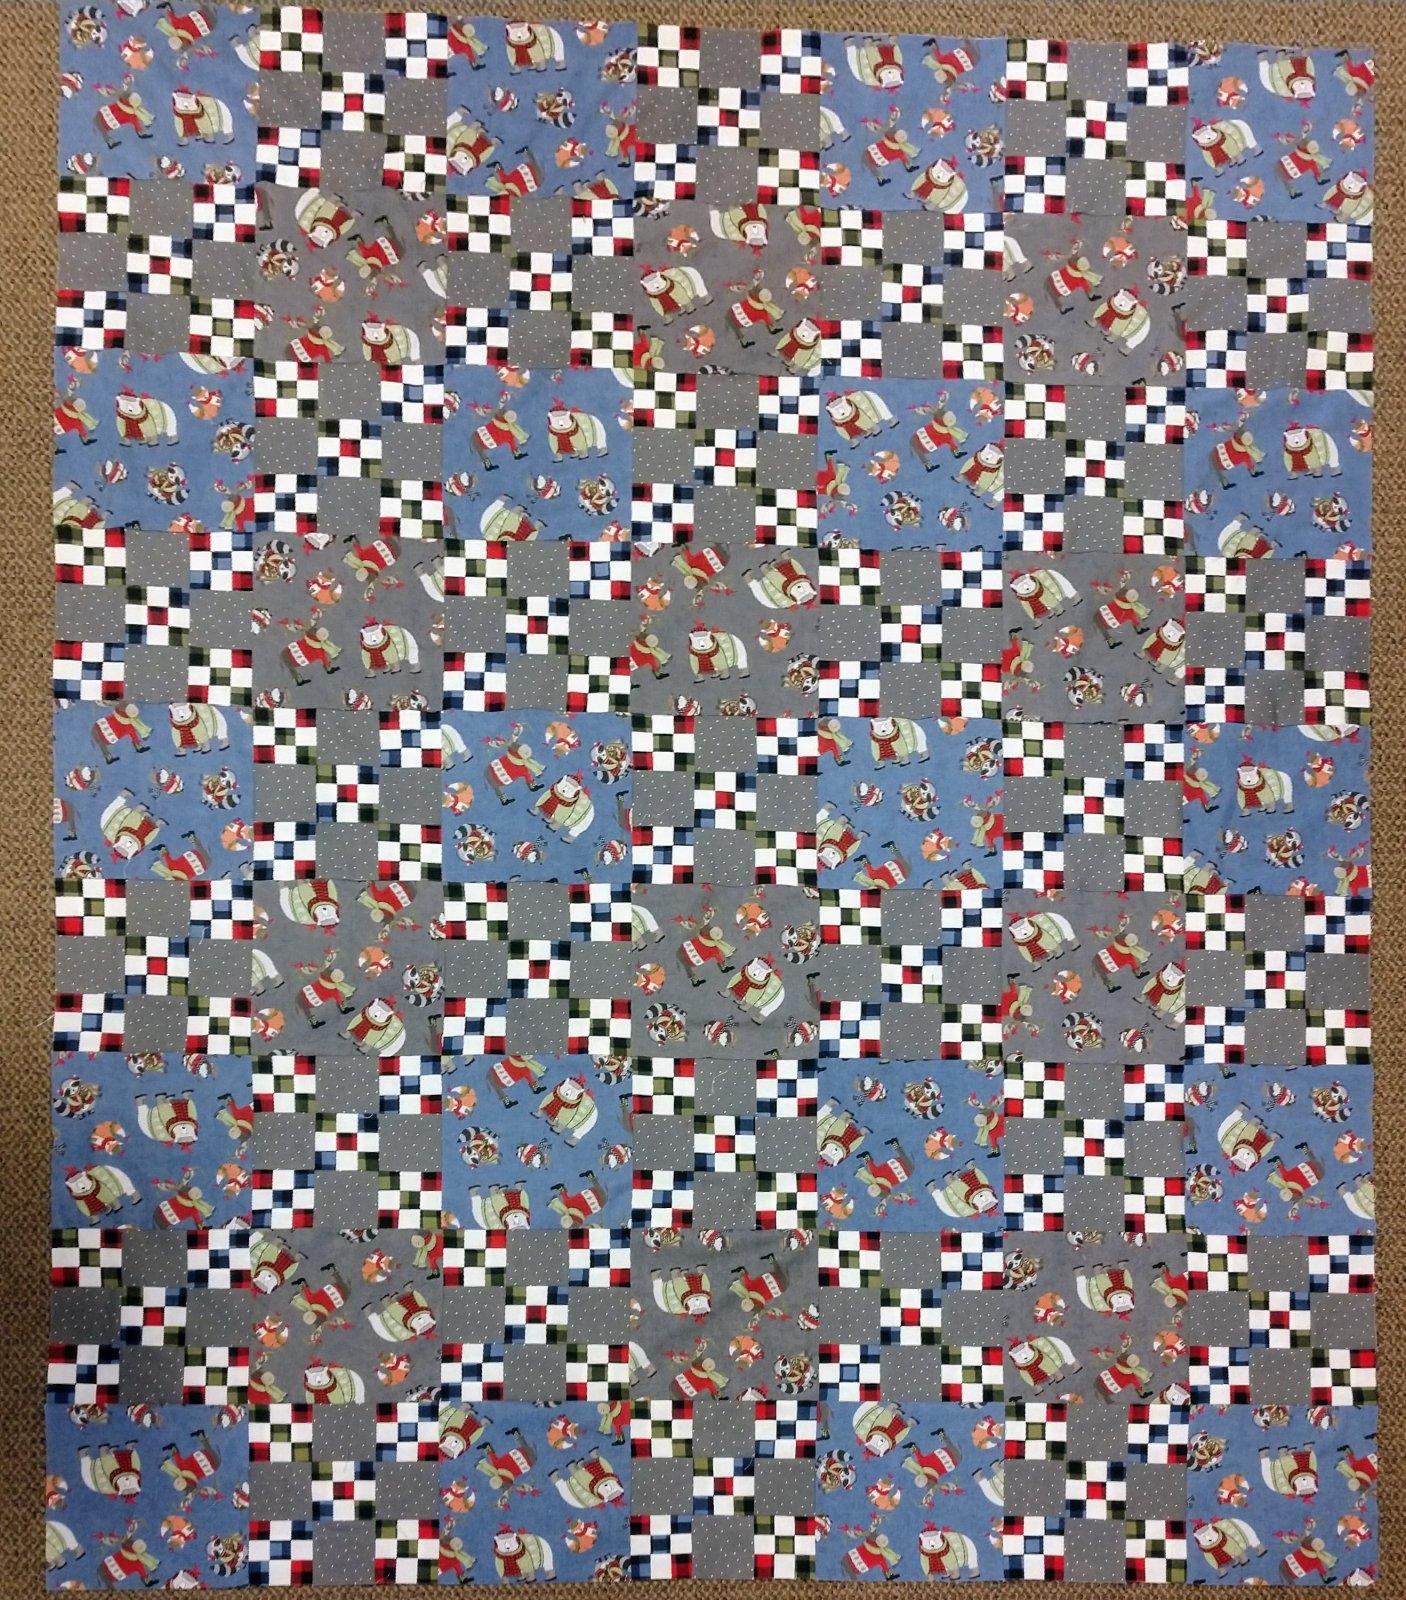 Cozy Critter's Quilt (63 x81)